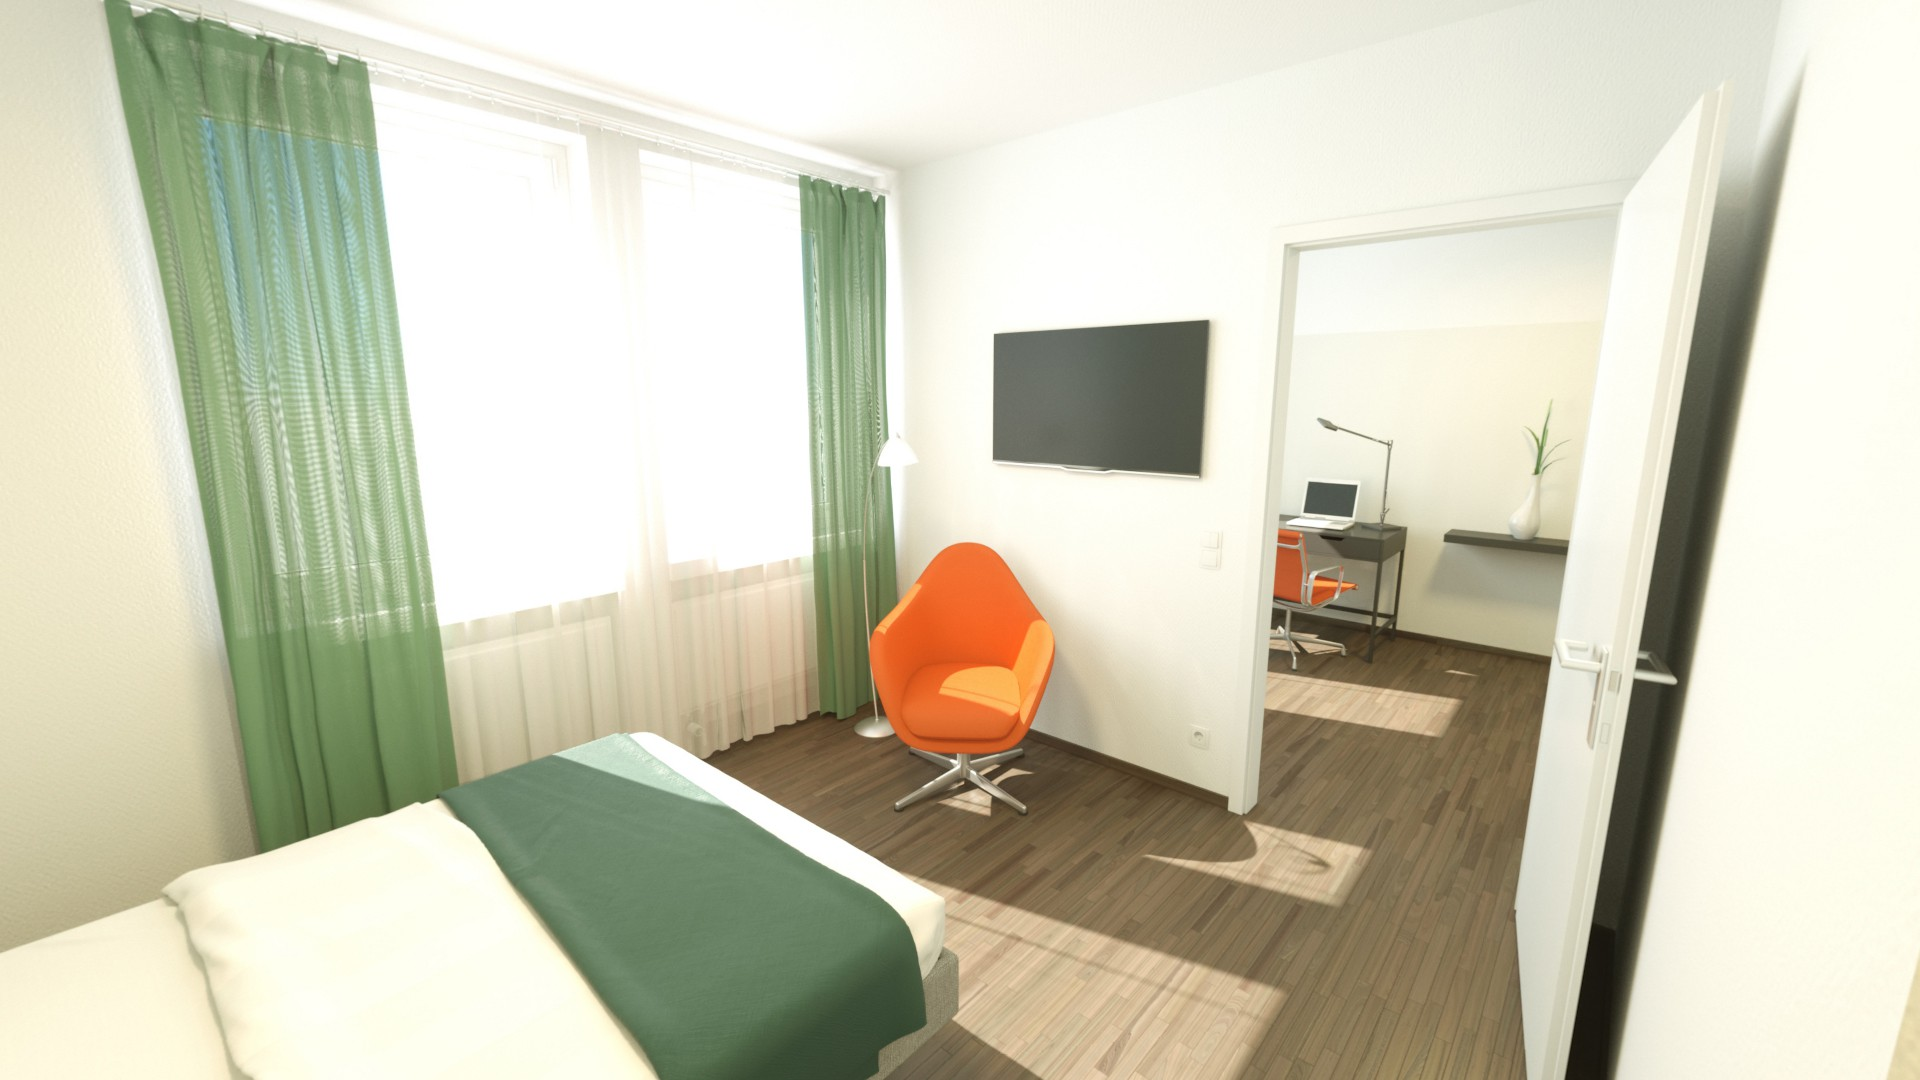 P&I Visualisierung Plankosmos Apartment